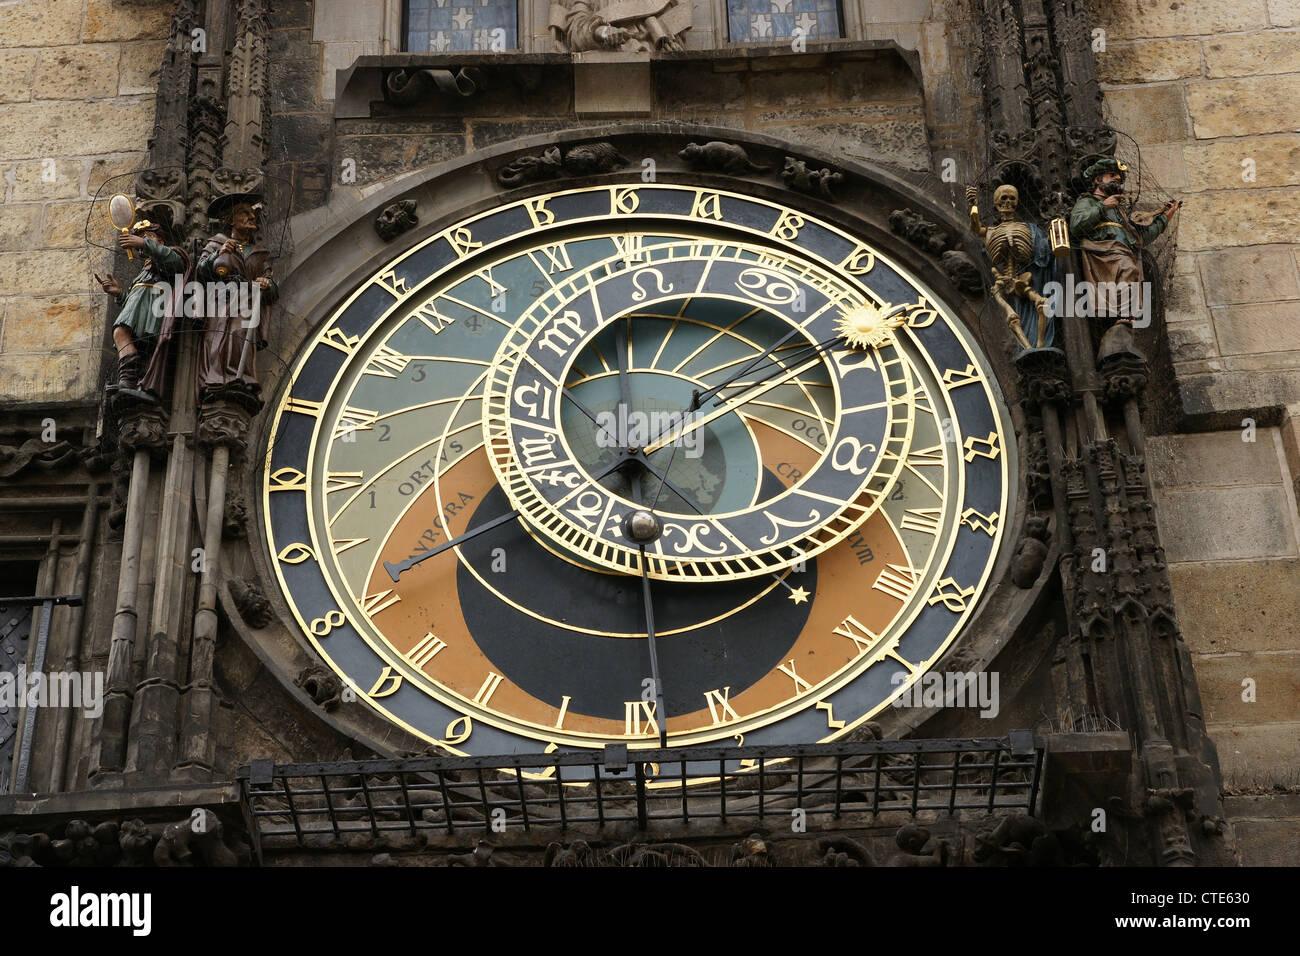 The Prague Astronomical Clock or Prague Orloj. Old Town City Hall. Astronomical dial. Czech Republic. - Stock Image